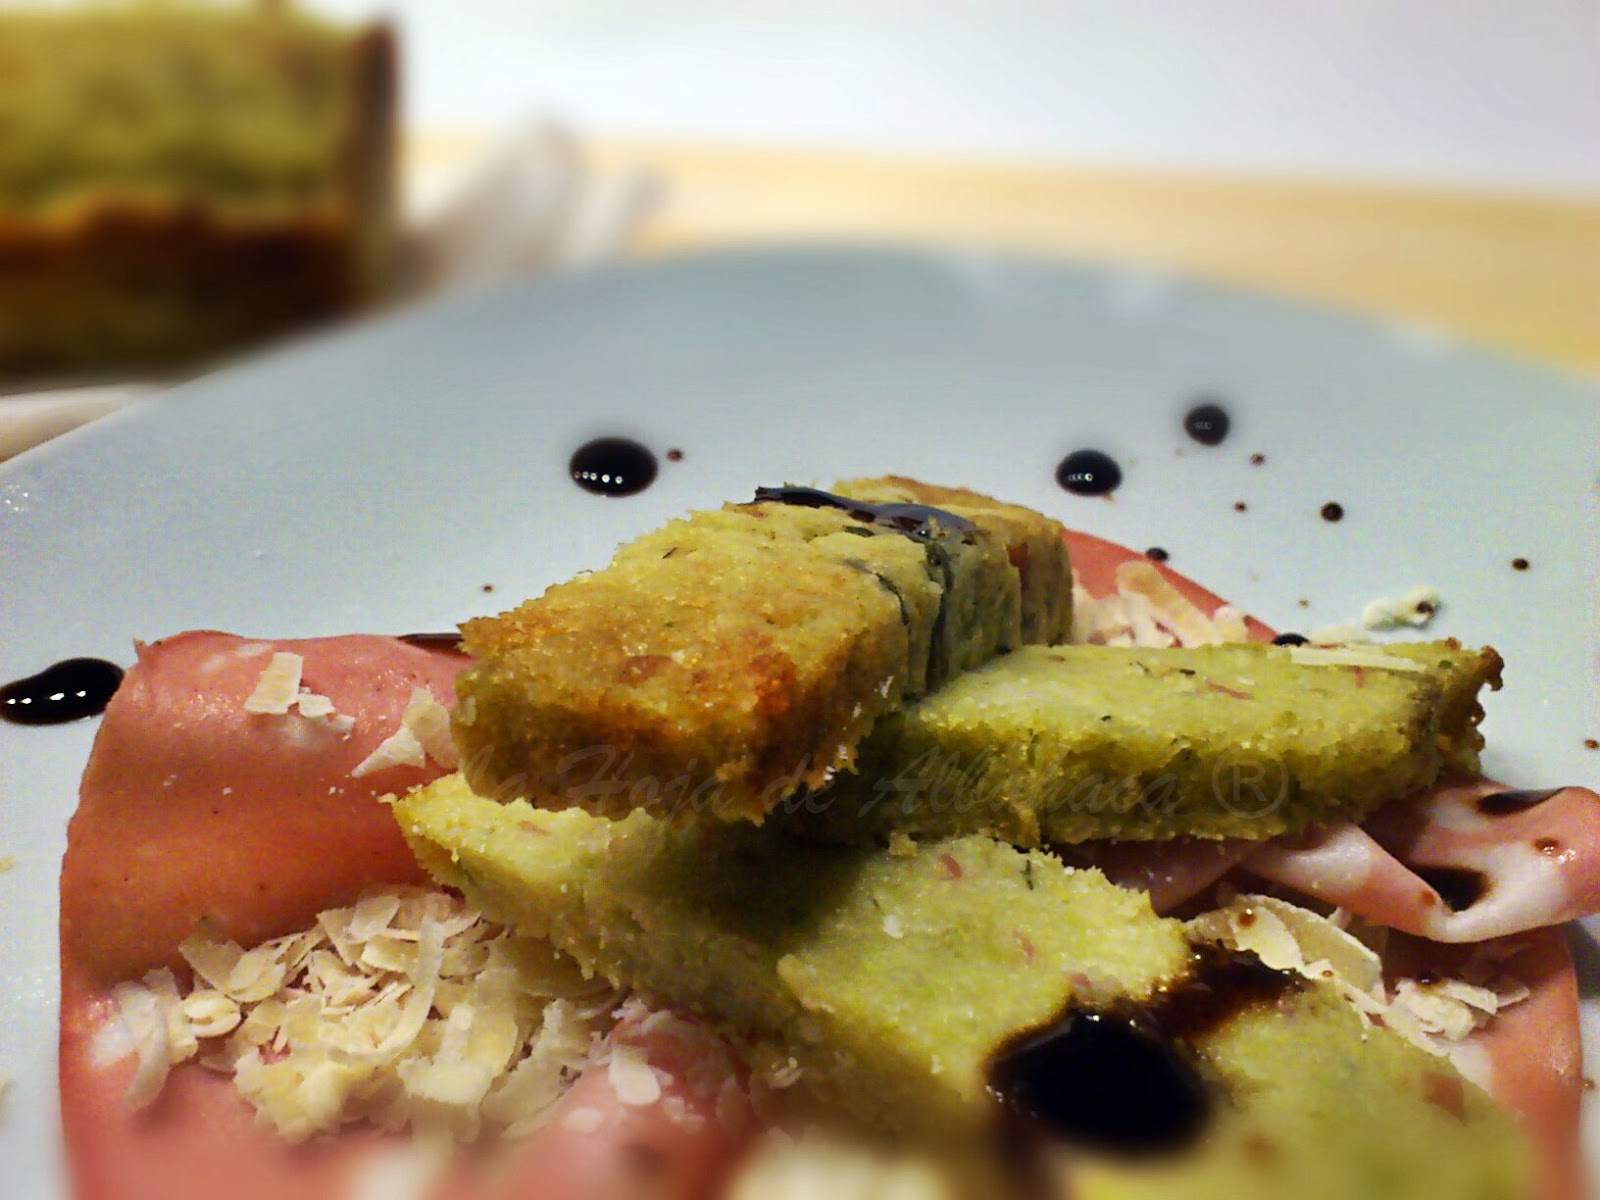 Pastel de brócoli romanesco, gelatina de vinagre de Módena,harina de semola de trigo duro, alcaparras, brócoli romanesco. Mulino Marino, Si.Gi., Gelatina de vinagre de Modena